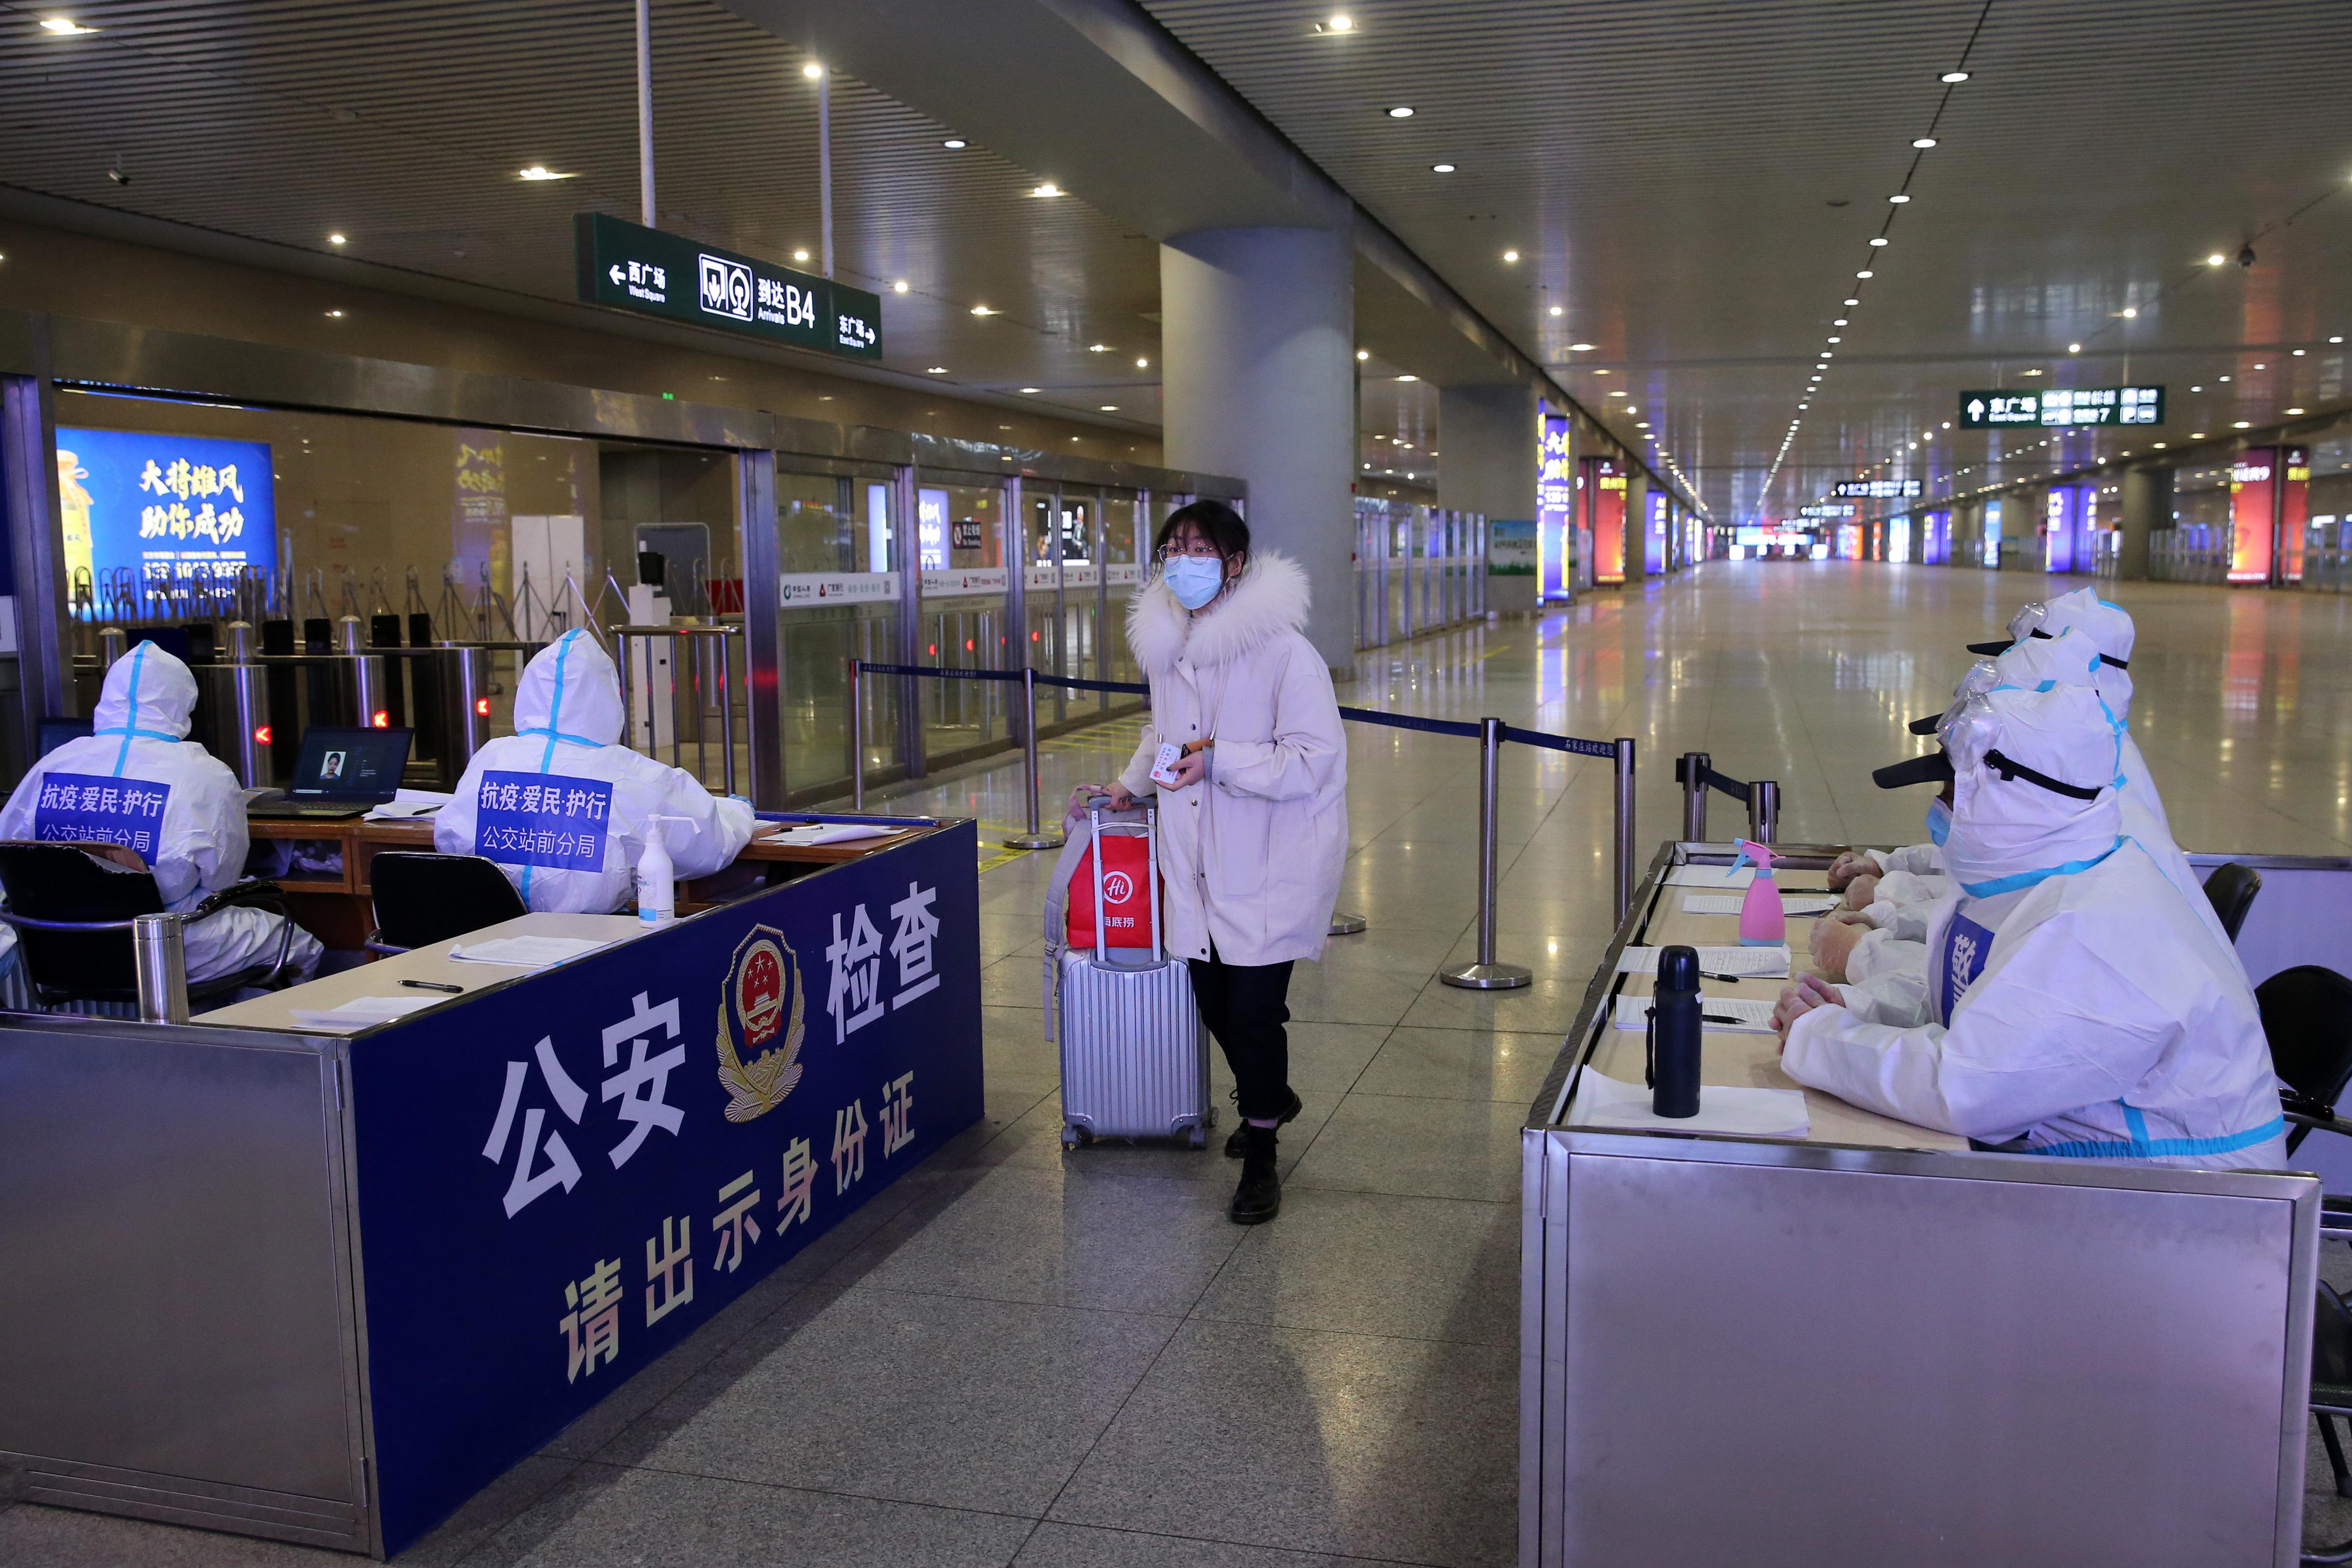 Shijiazhuang railway station checks, disinfects passengers